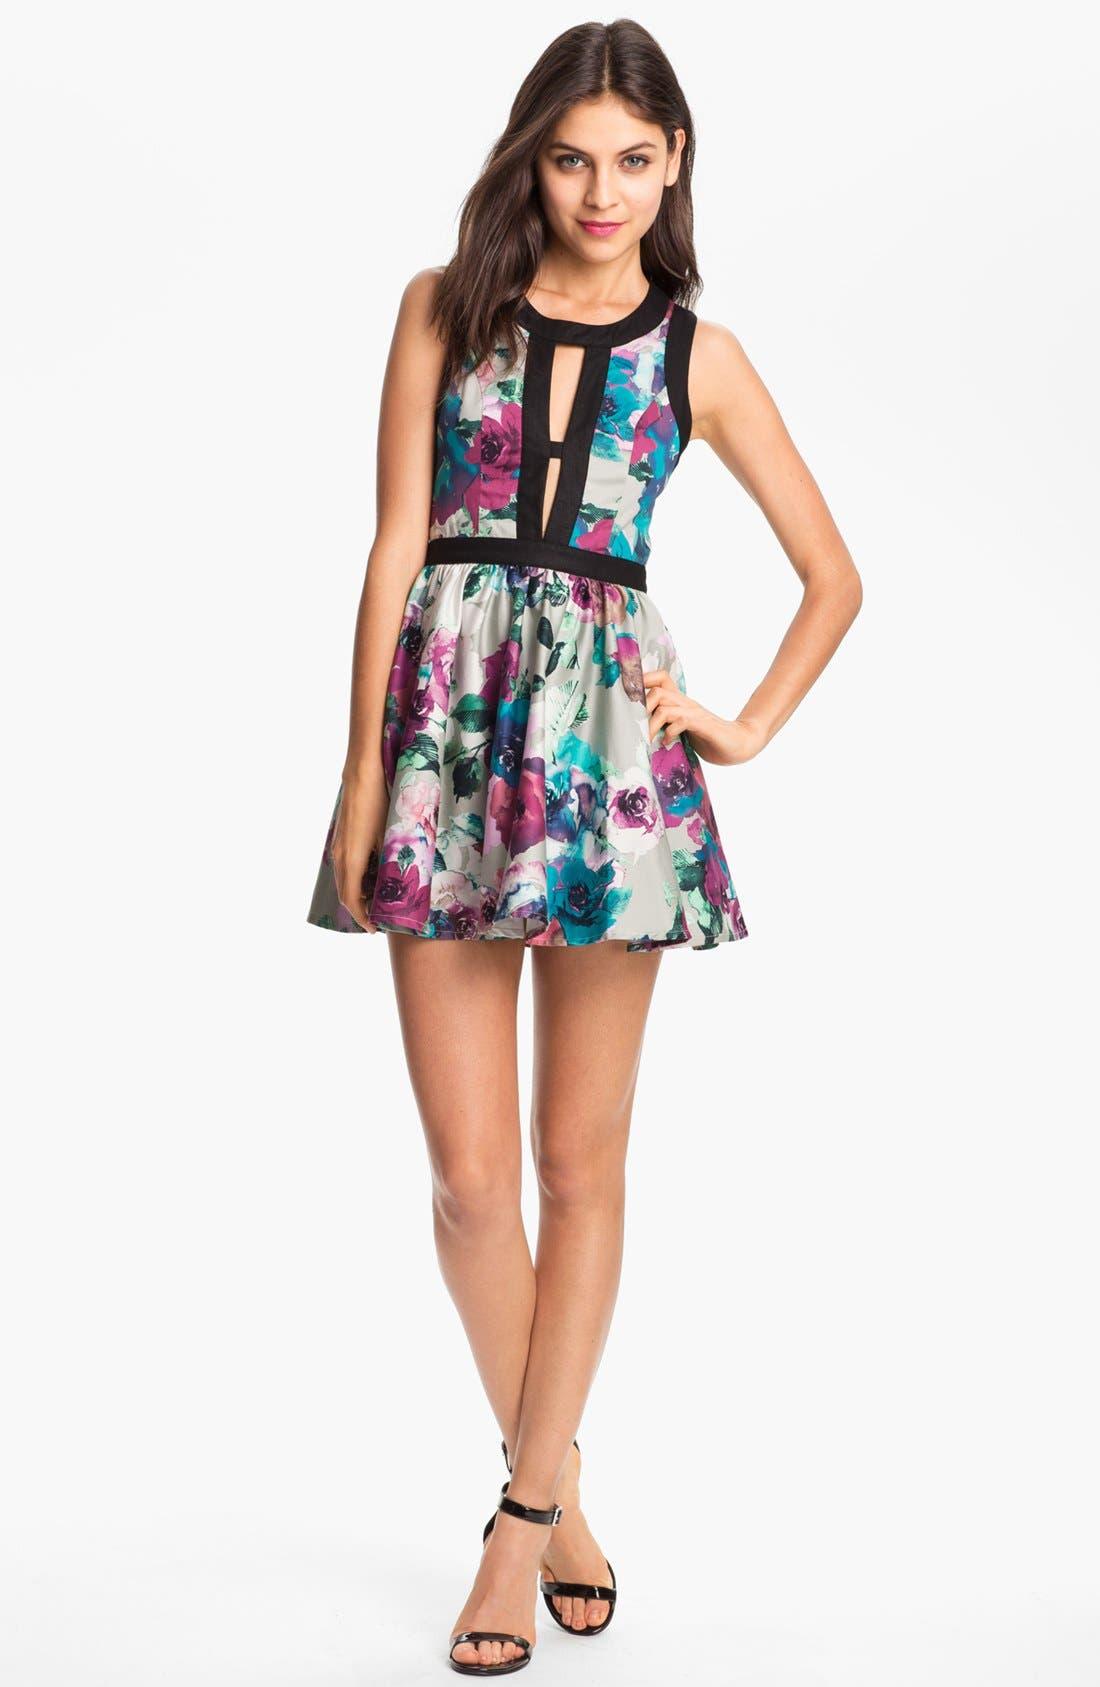 Alternate Image 1 Selected - Keepsake the Label 'Day Dream' Print Fit & Flare Dress